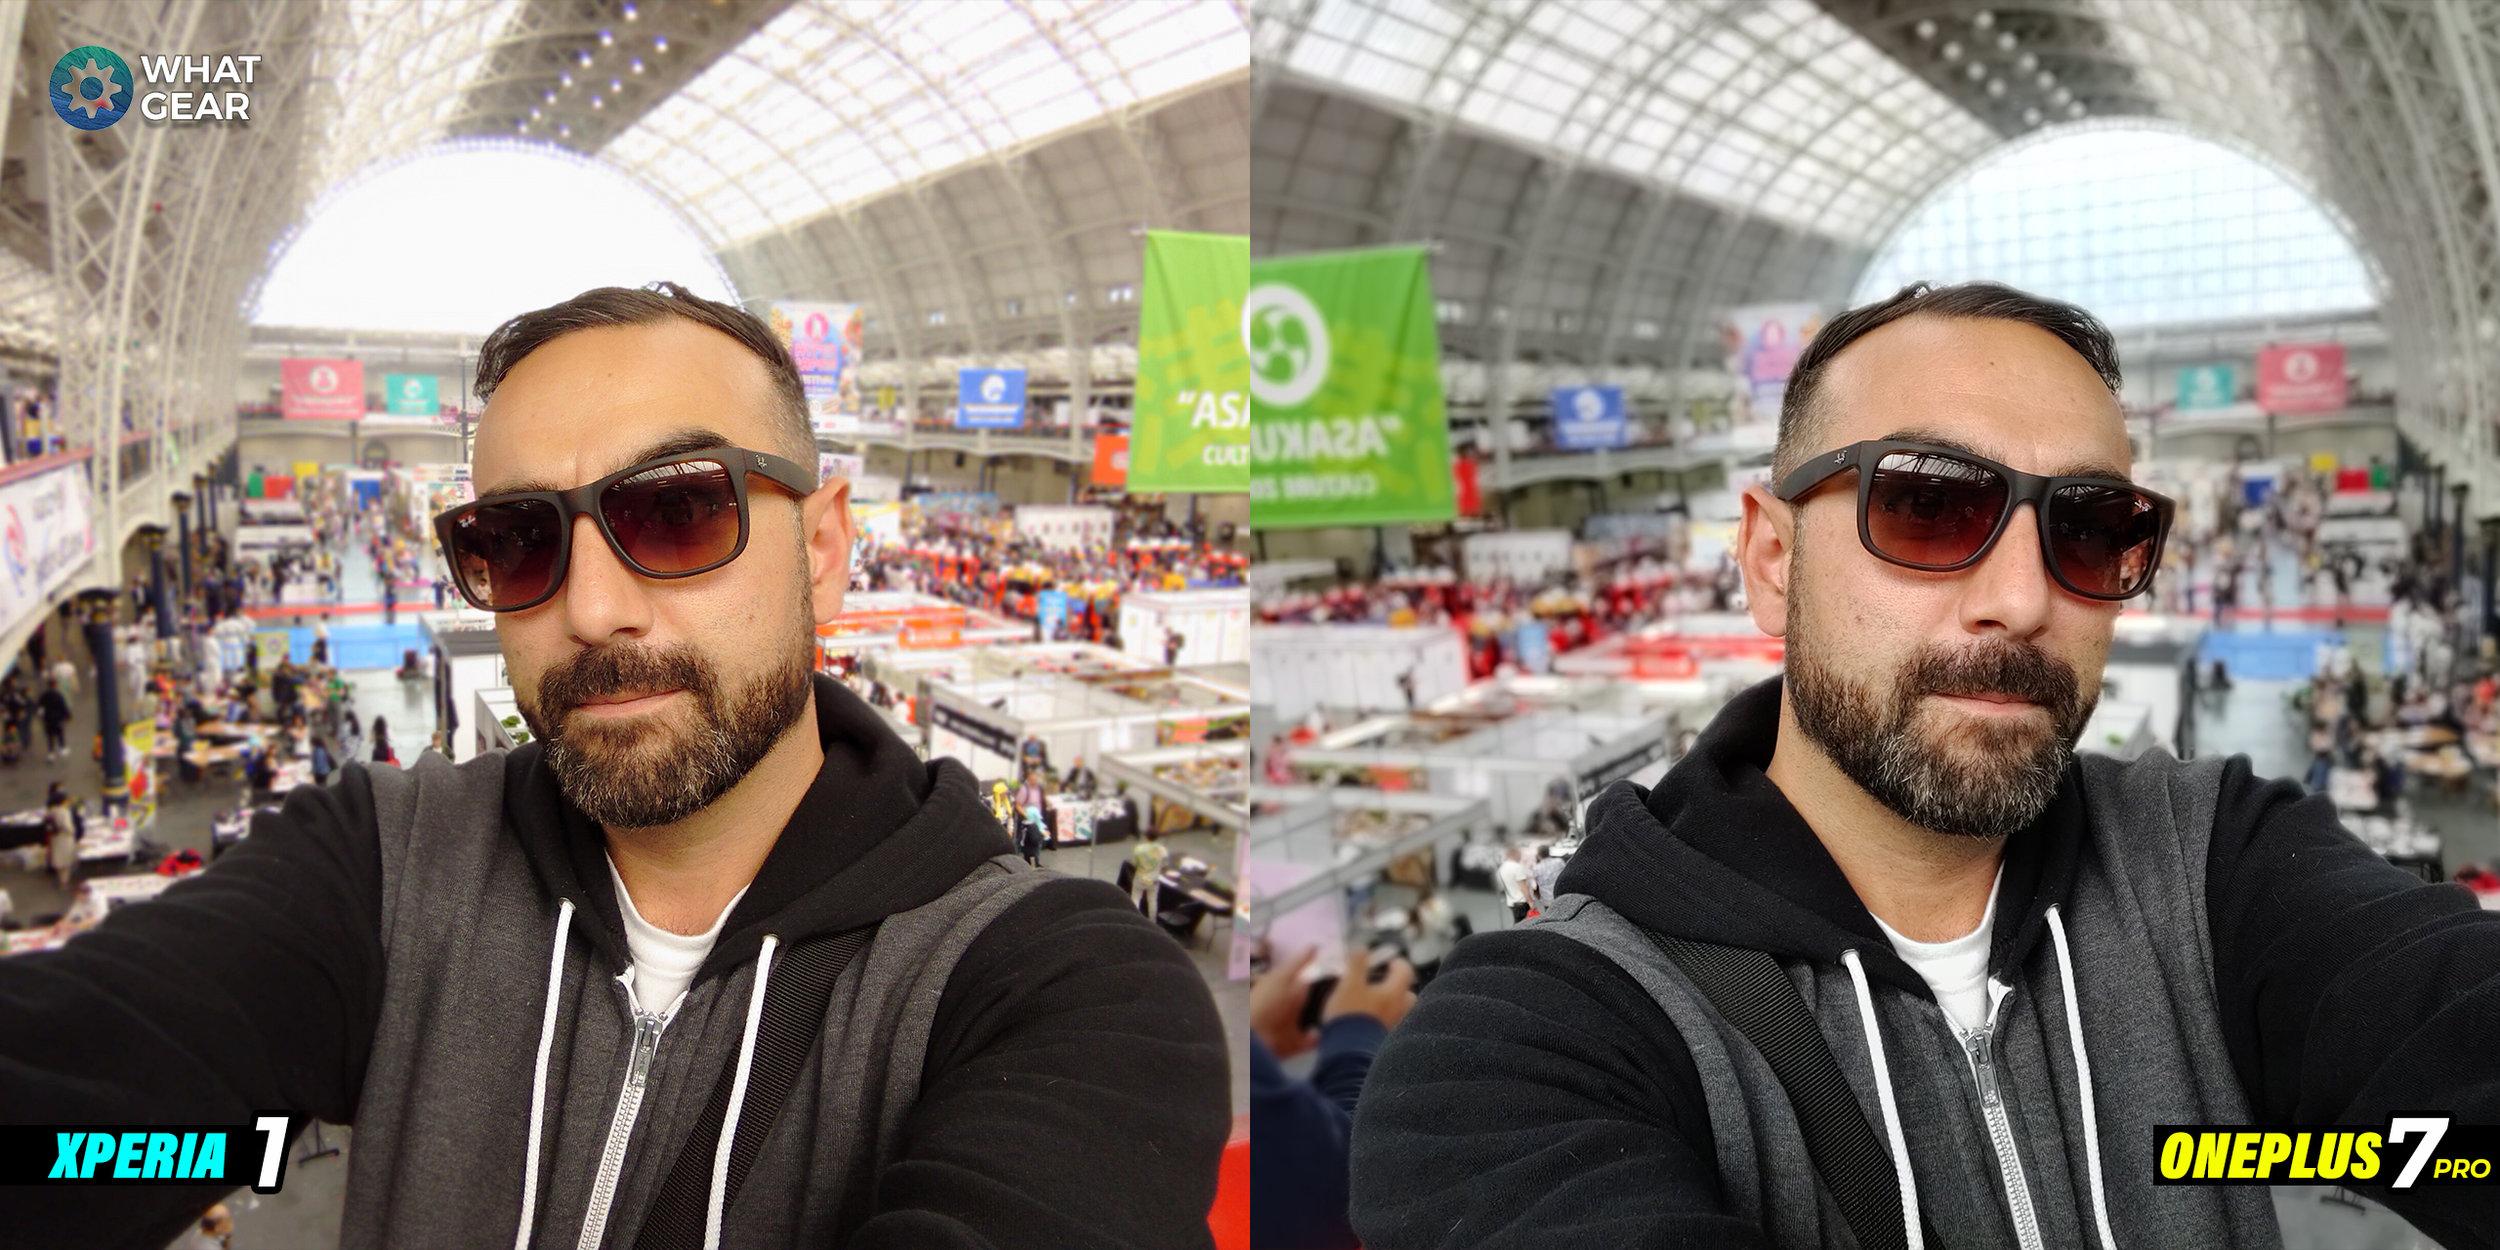 sony xperia 1 vs oneplus 7 pro camera 3.jpg